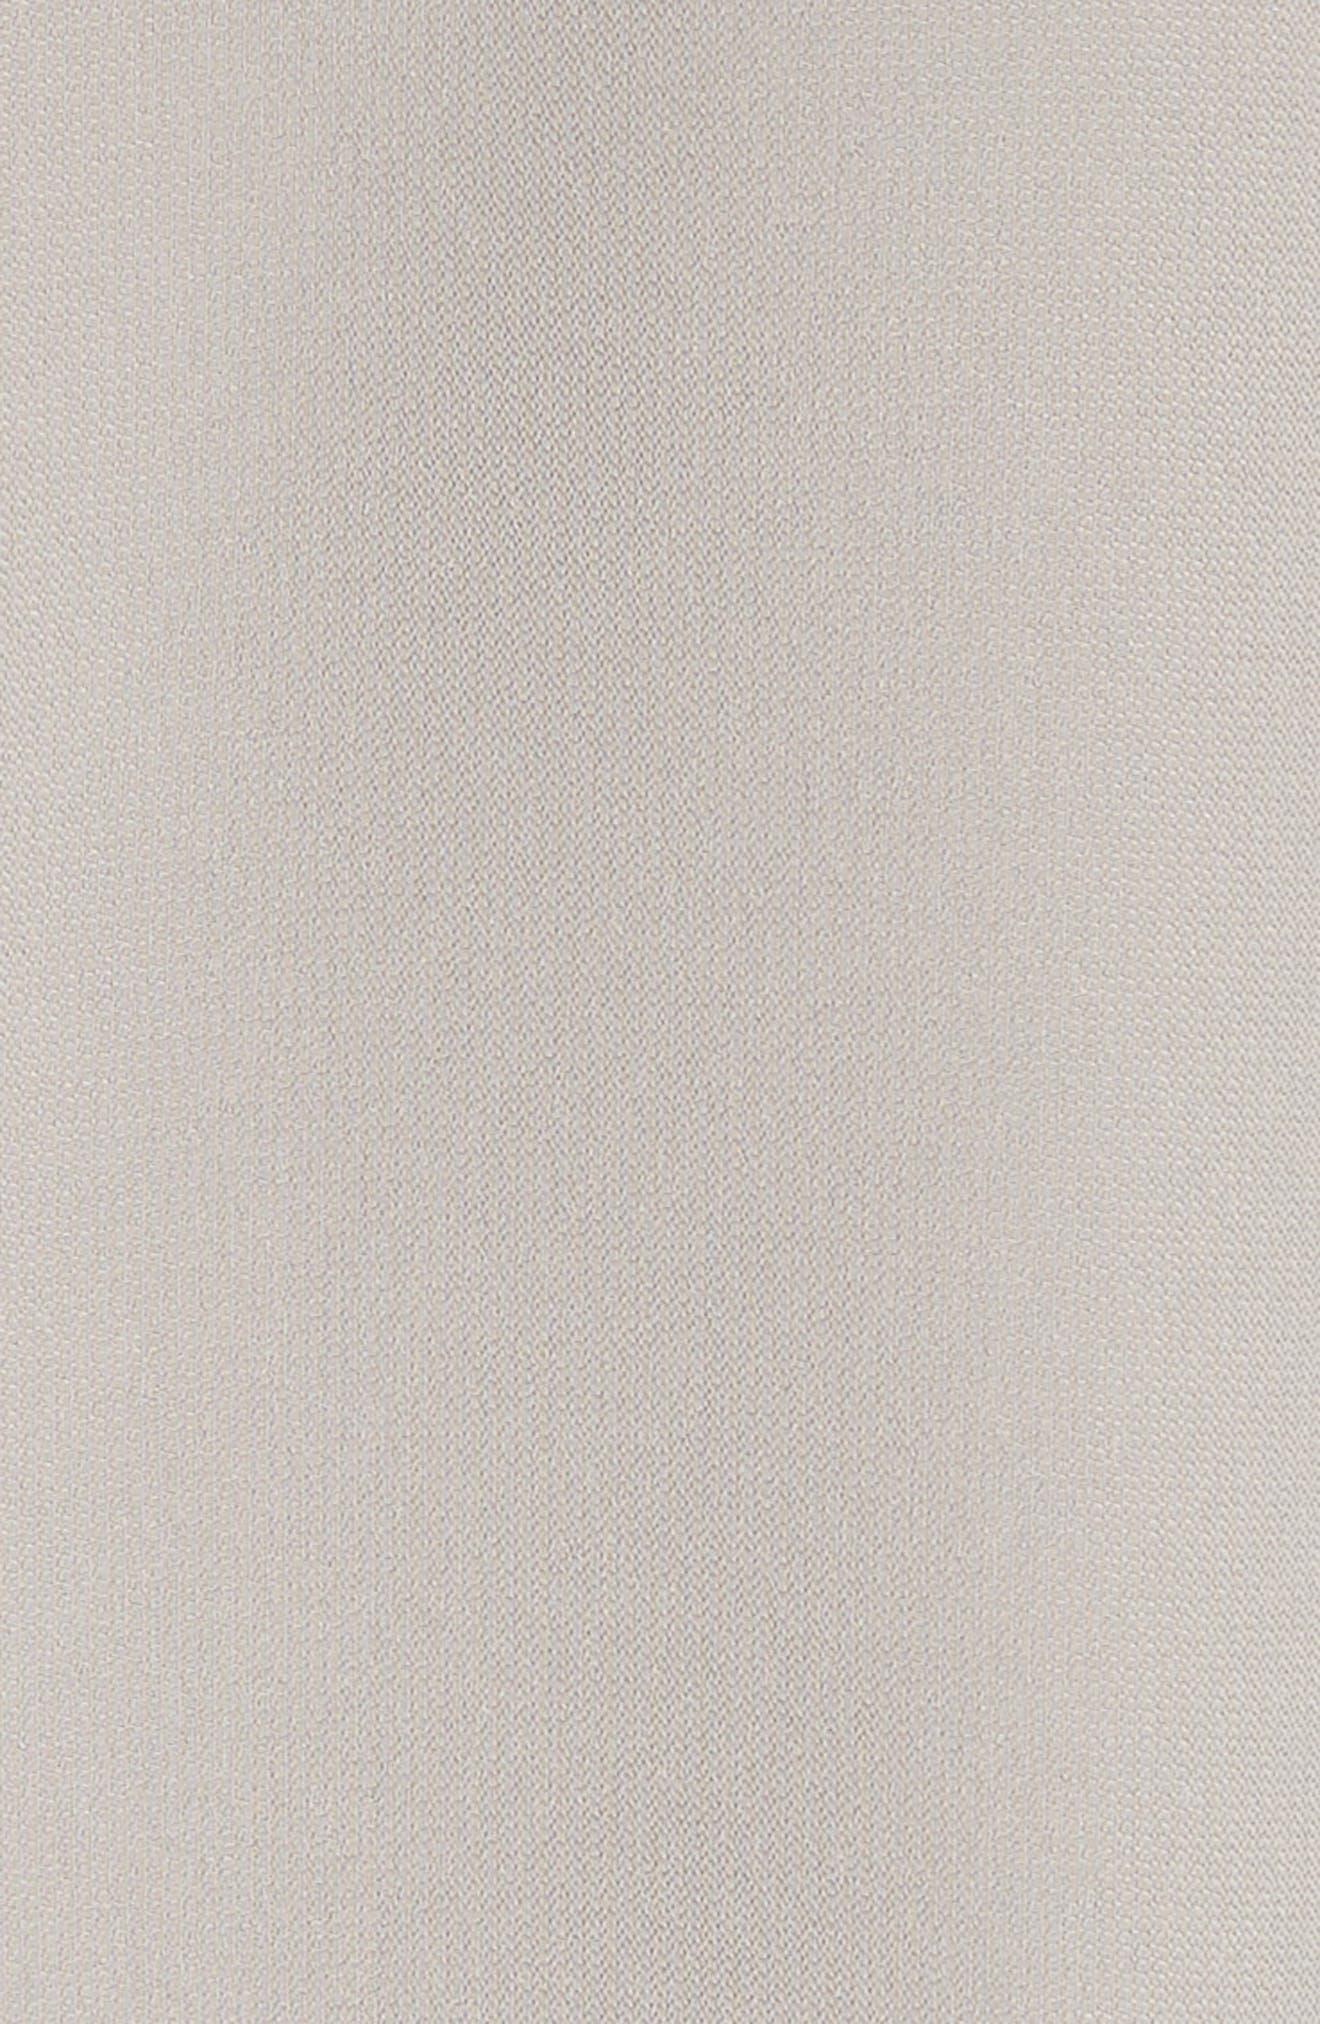 Dolman Sleeve Top,                             Alternate thumbnail 5, color,                             Rope